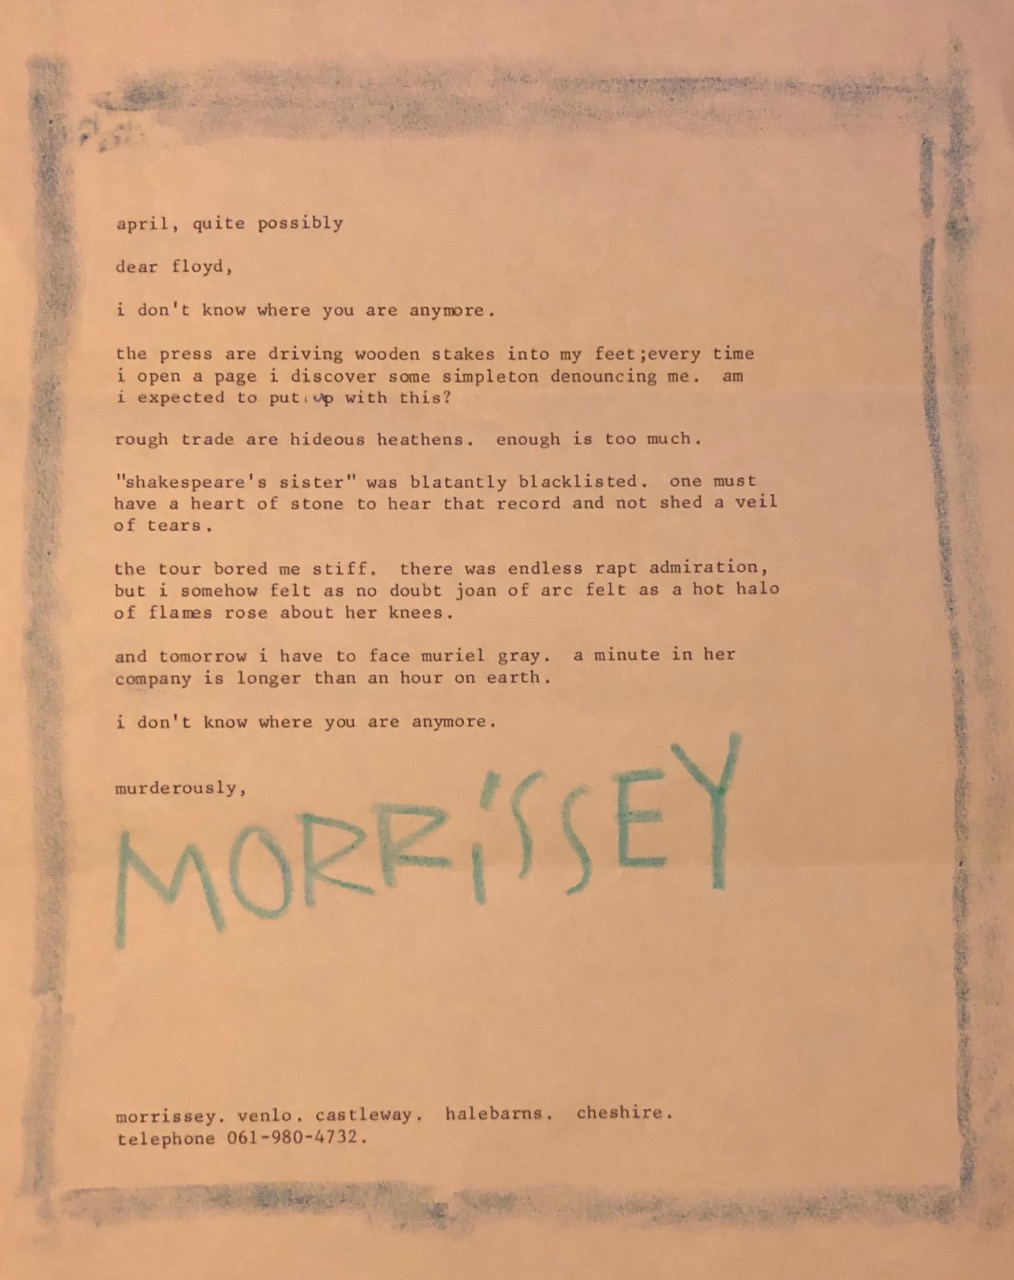 Morrissey_letter_to_Lloyd_Cole_april_1985.jpg